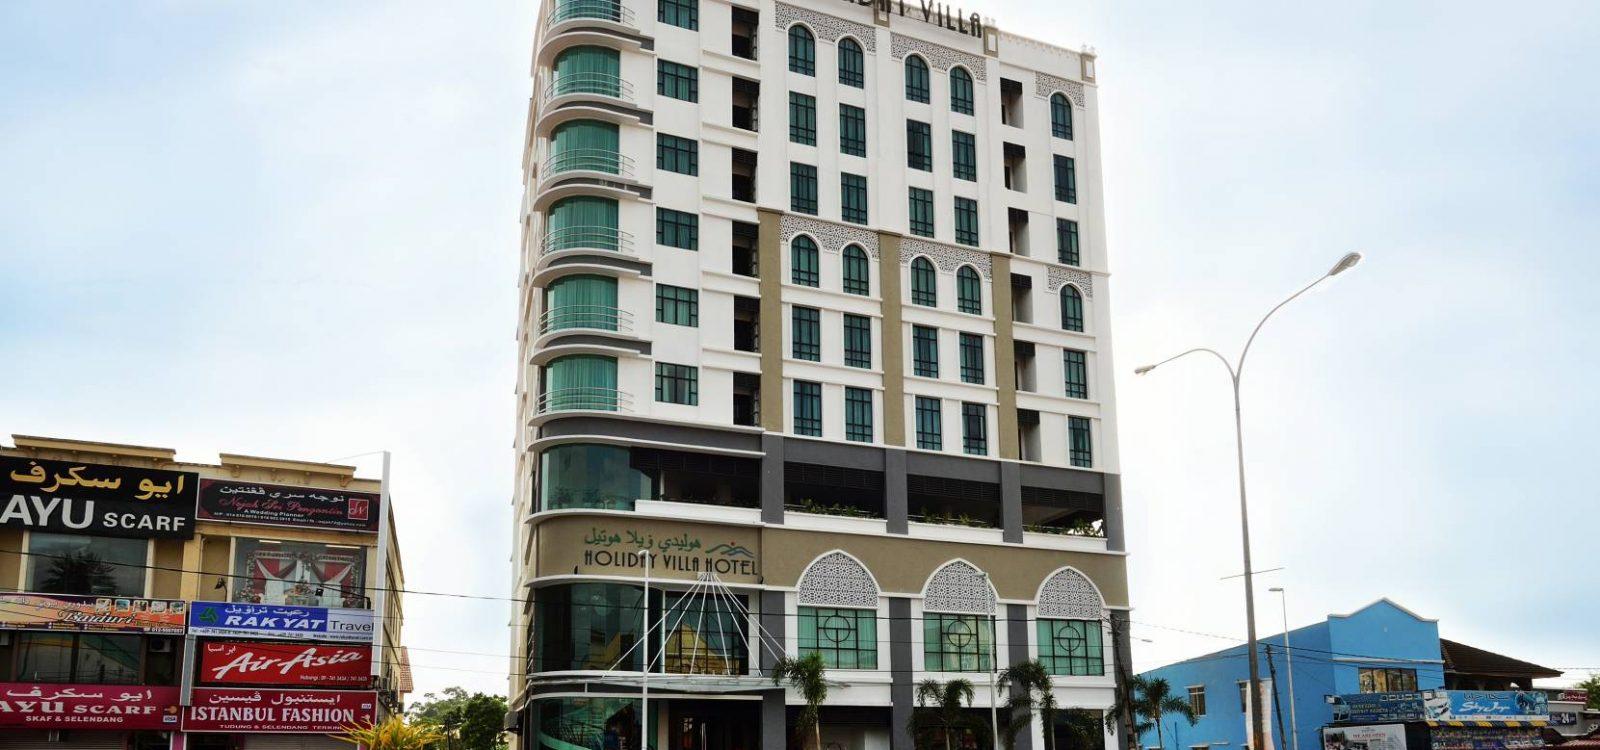 Holiday Villa Hotel Suites Kota Bharu Kelantan